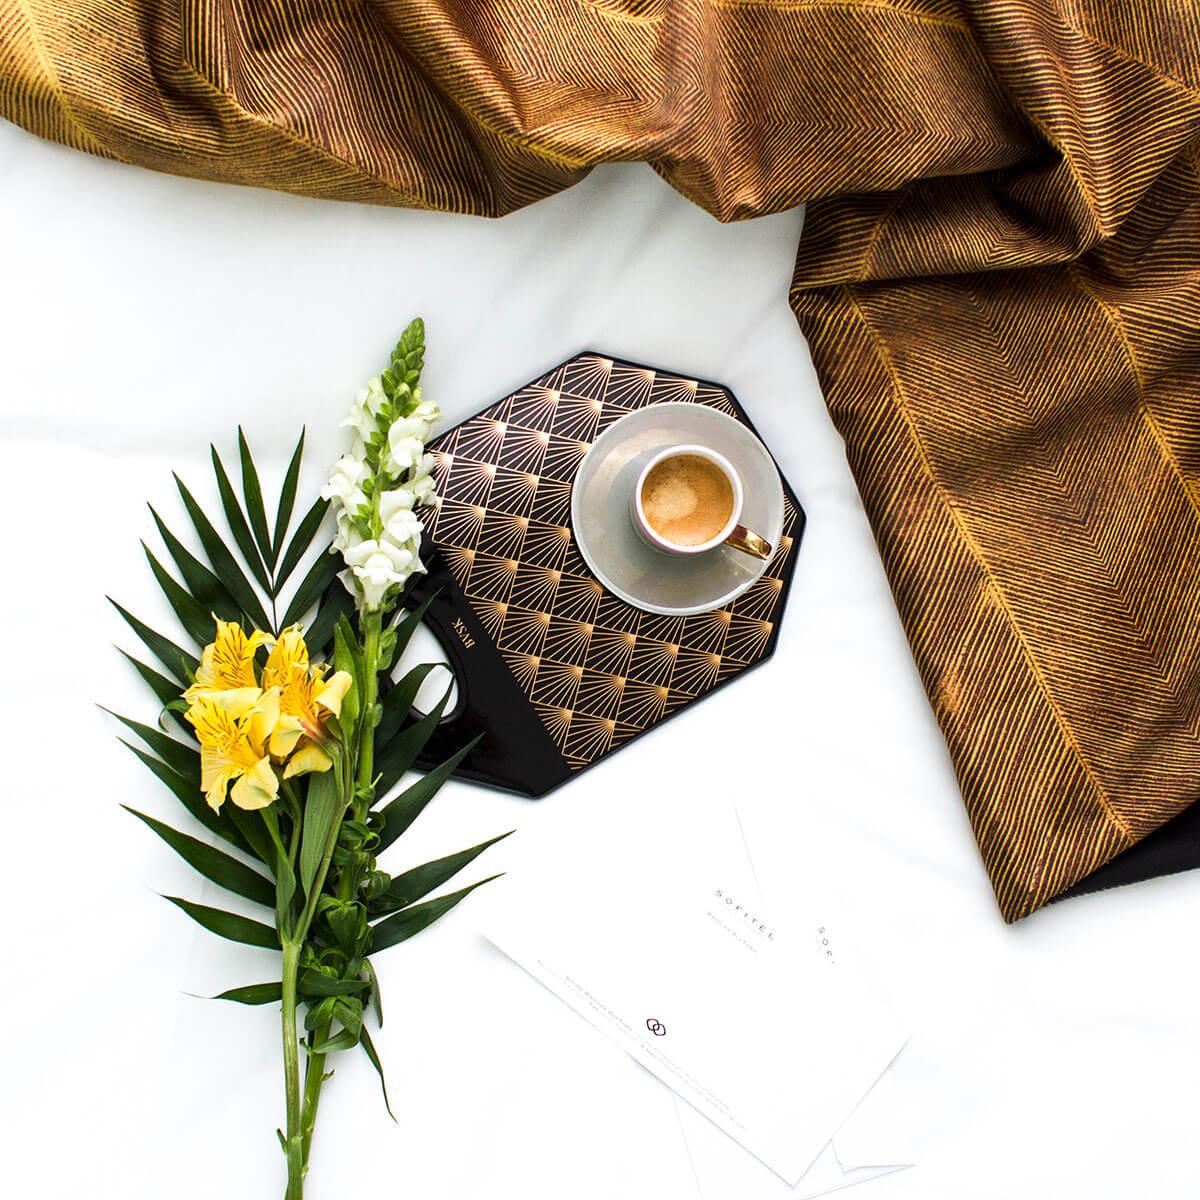 Sunray – Deska ceramiczna BVSK Kolekcja Art Deco Sofitel Lookbook